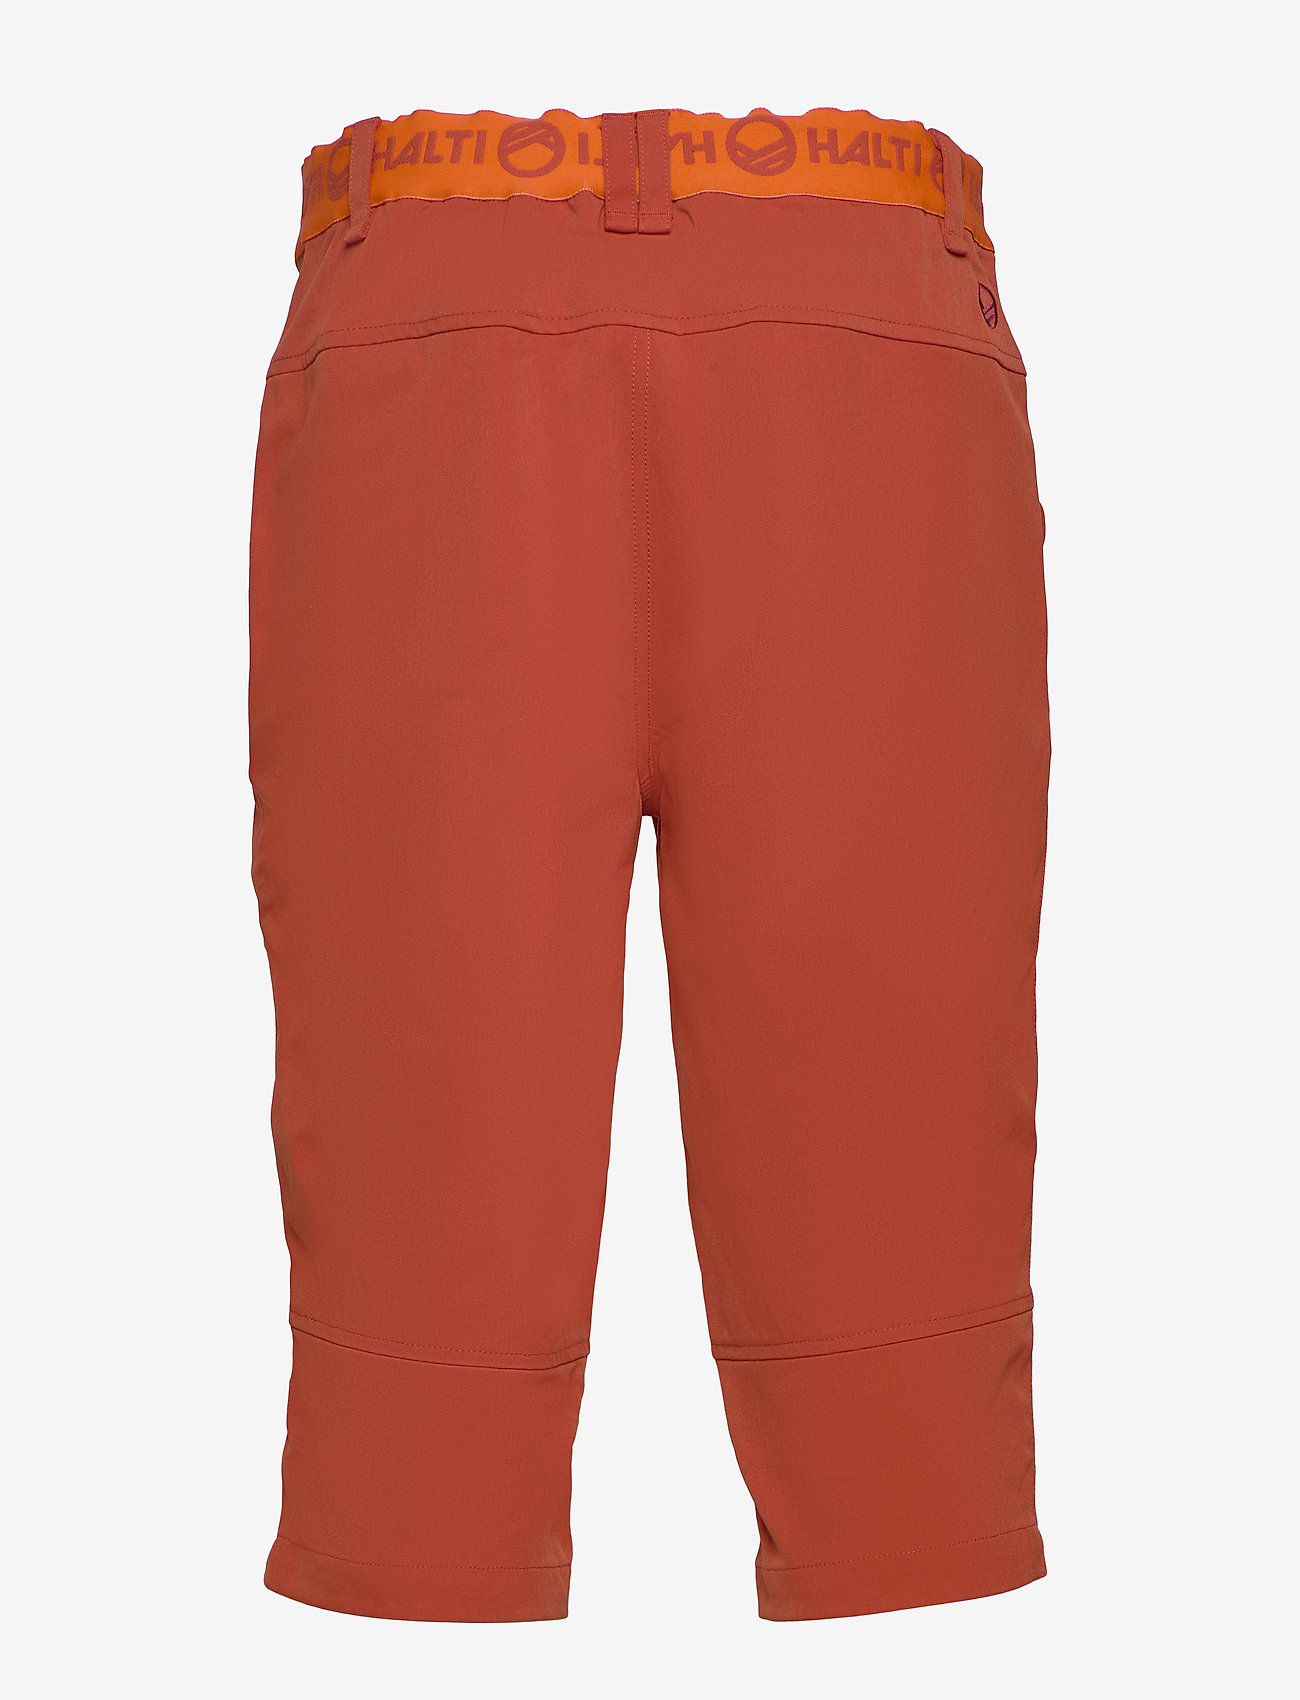 Halti - Vuokatti M Capri pants - wandel korte broek - ketchup red - 1